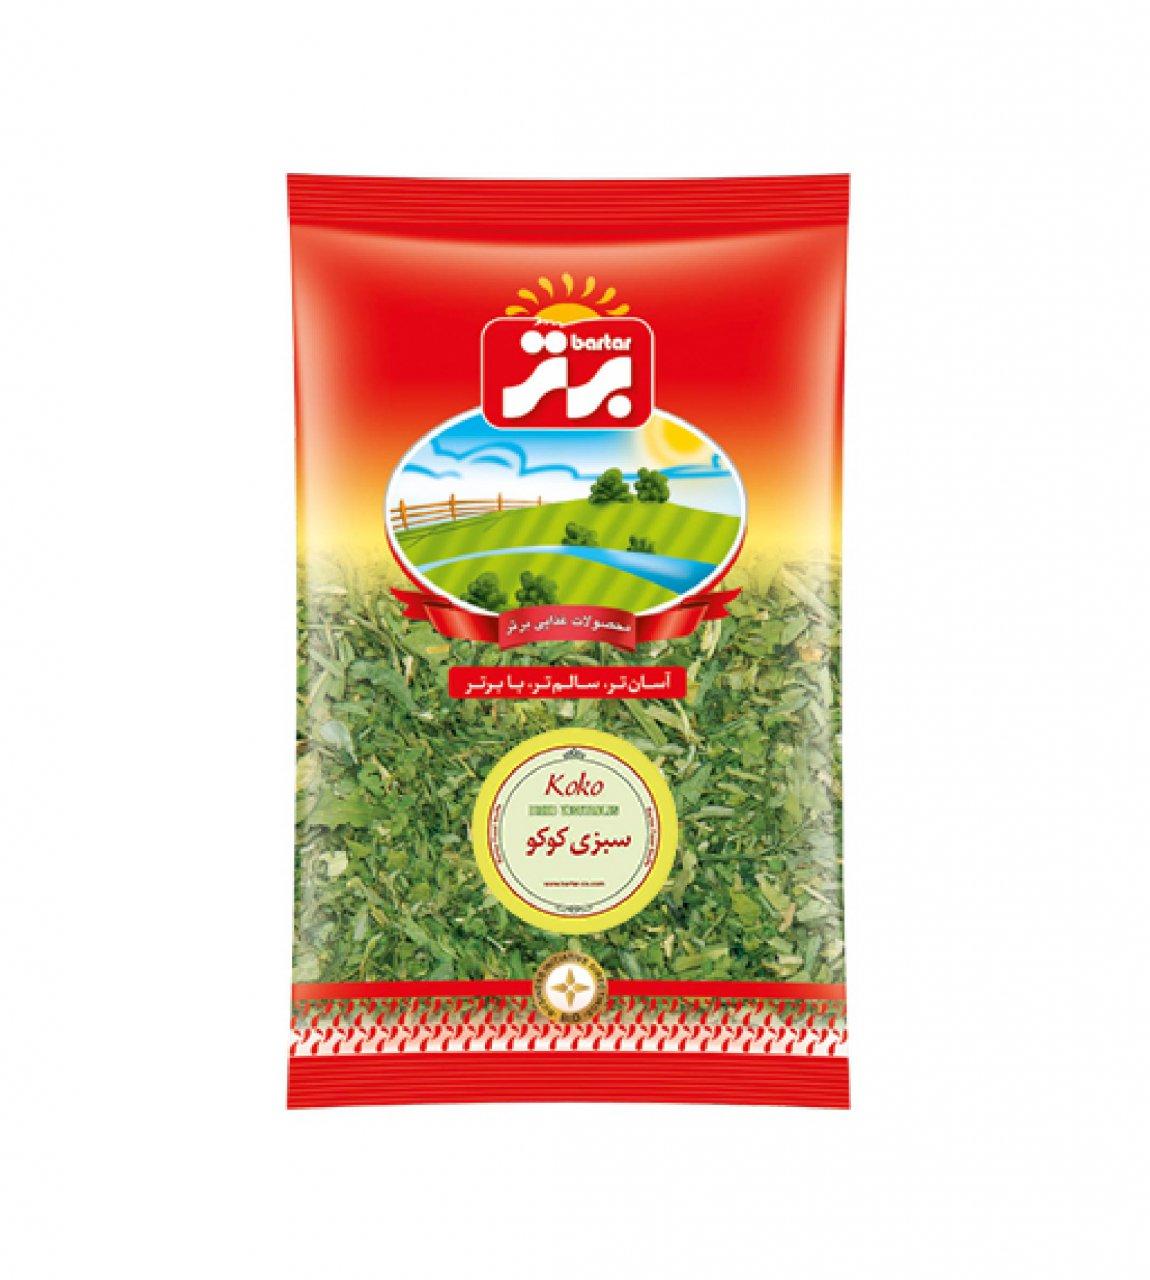 سبزی کوکو 70 گرم برتر